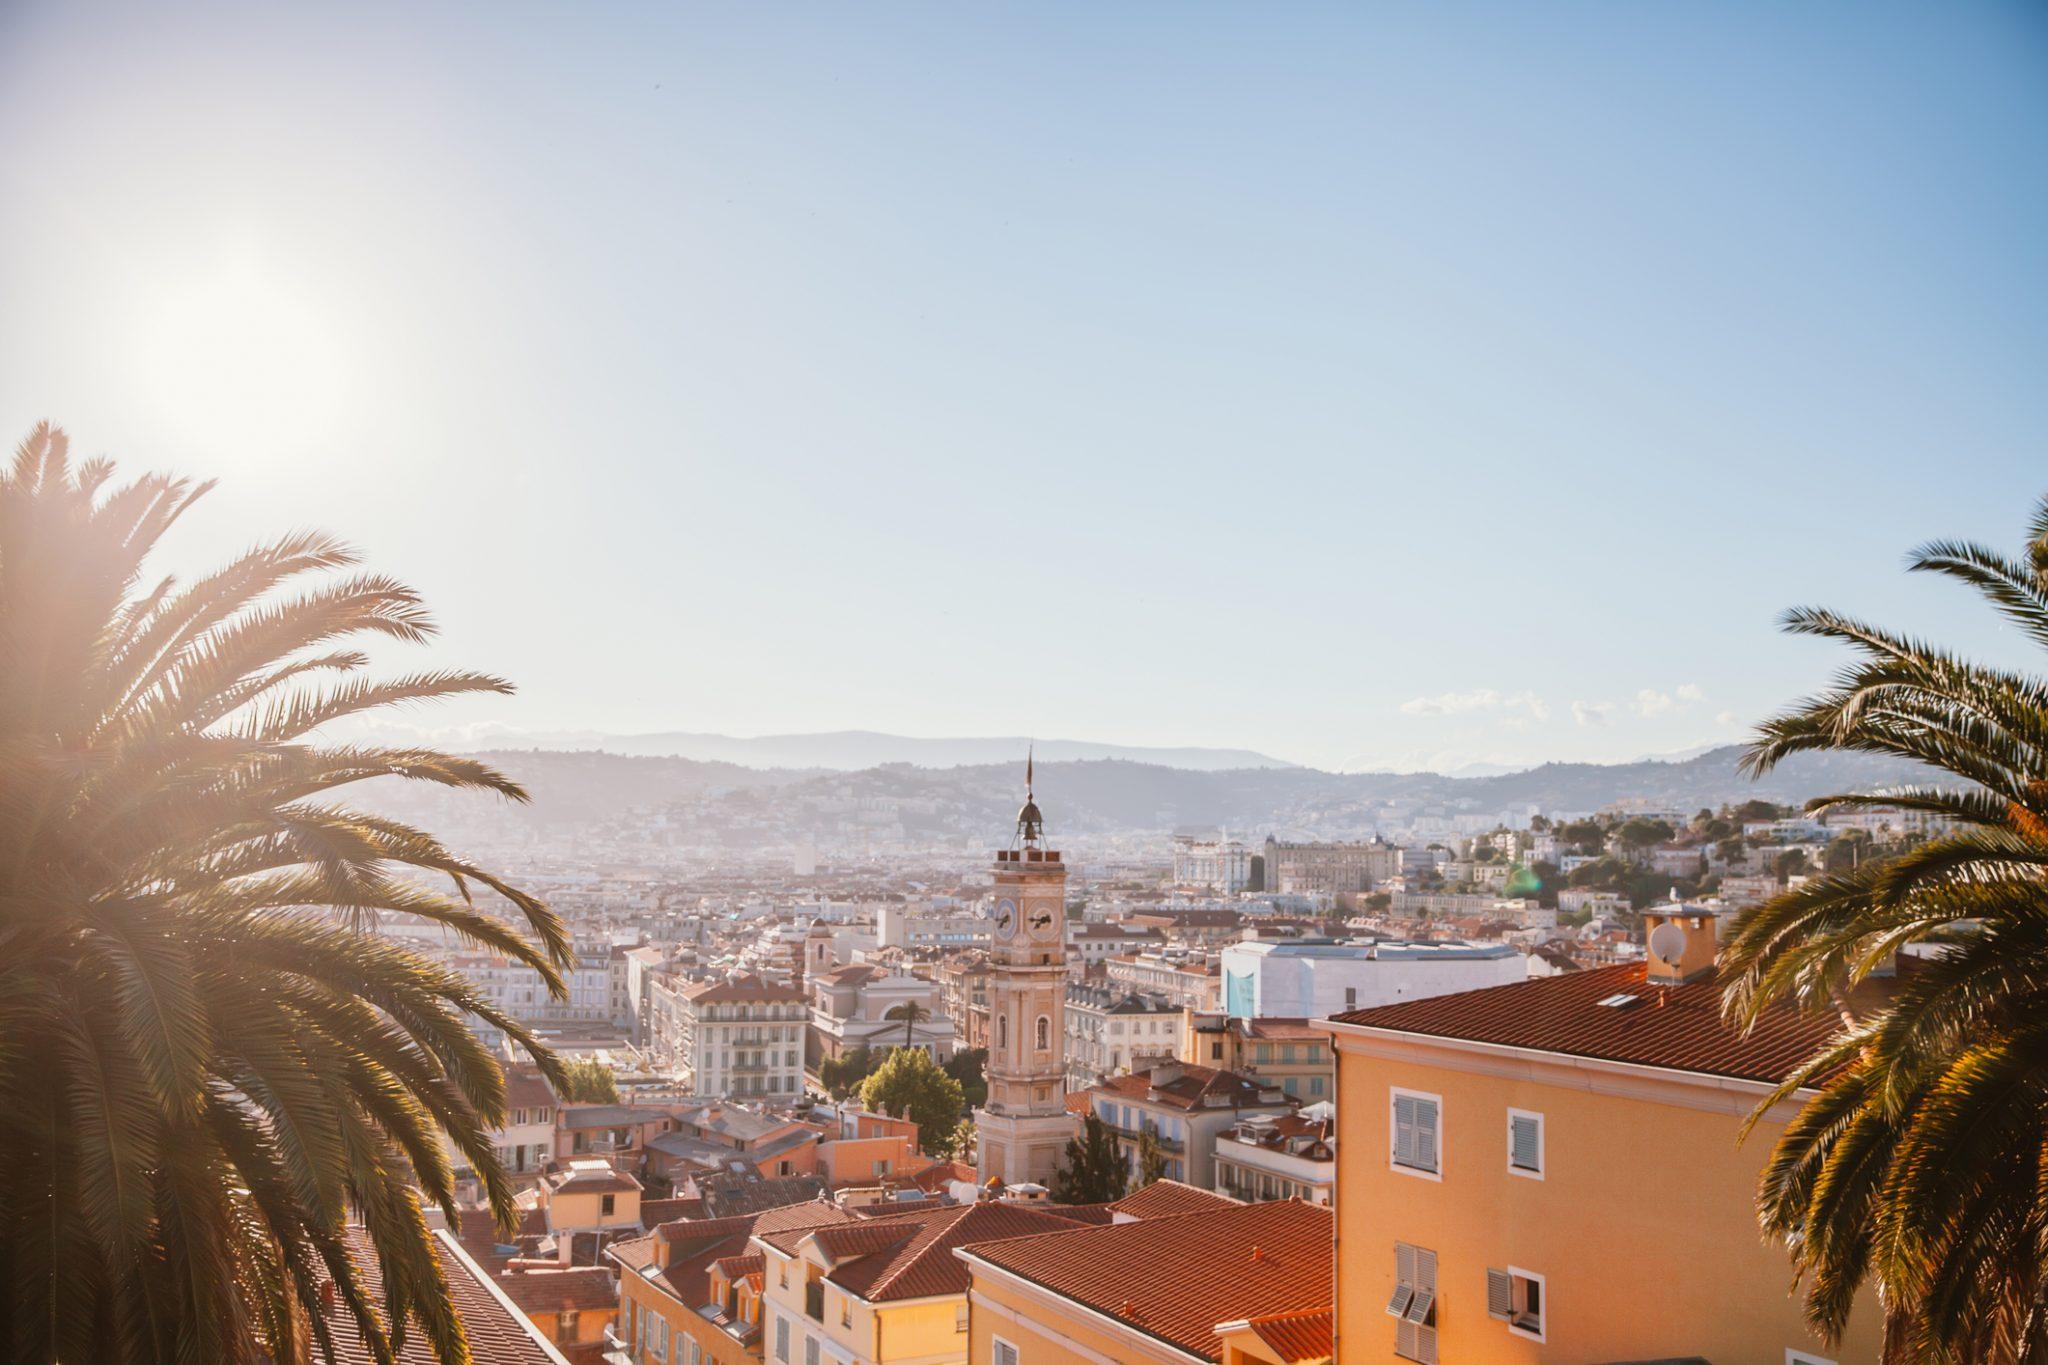 Taux crédit immobilier prêts immobiliers emprunt Nice